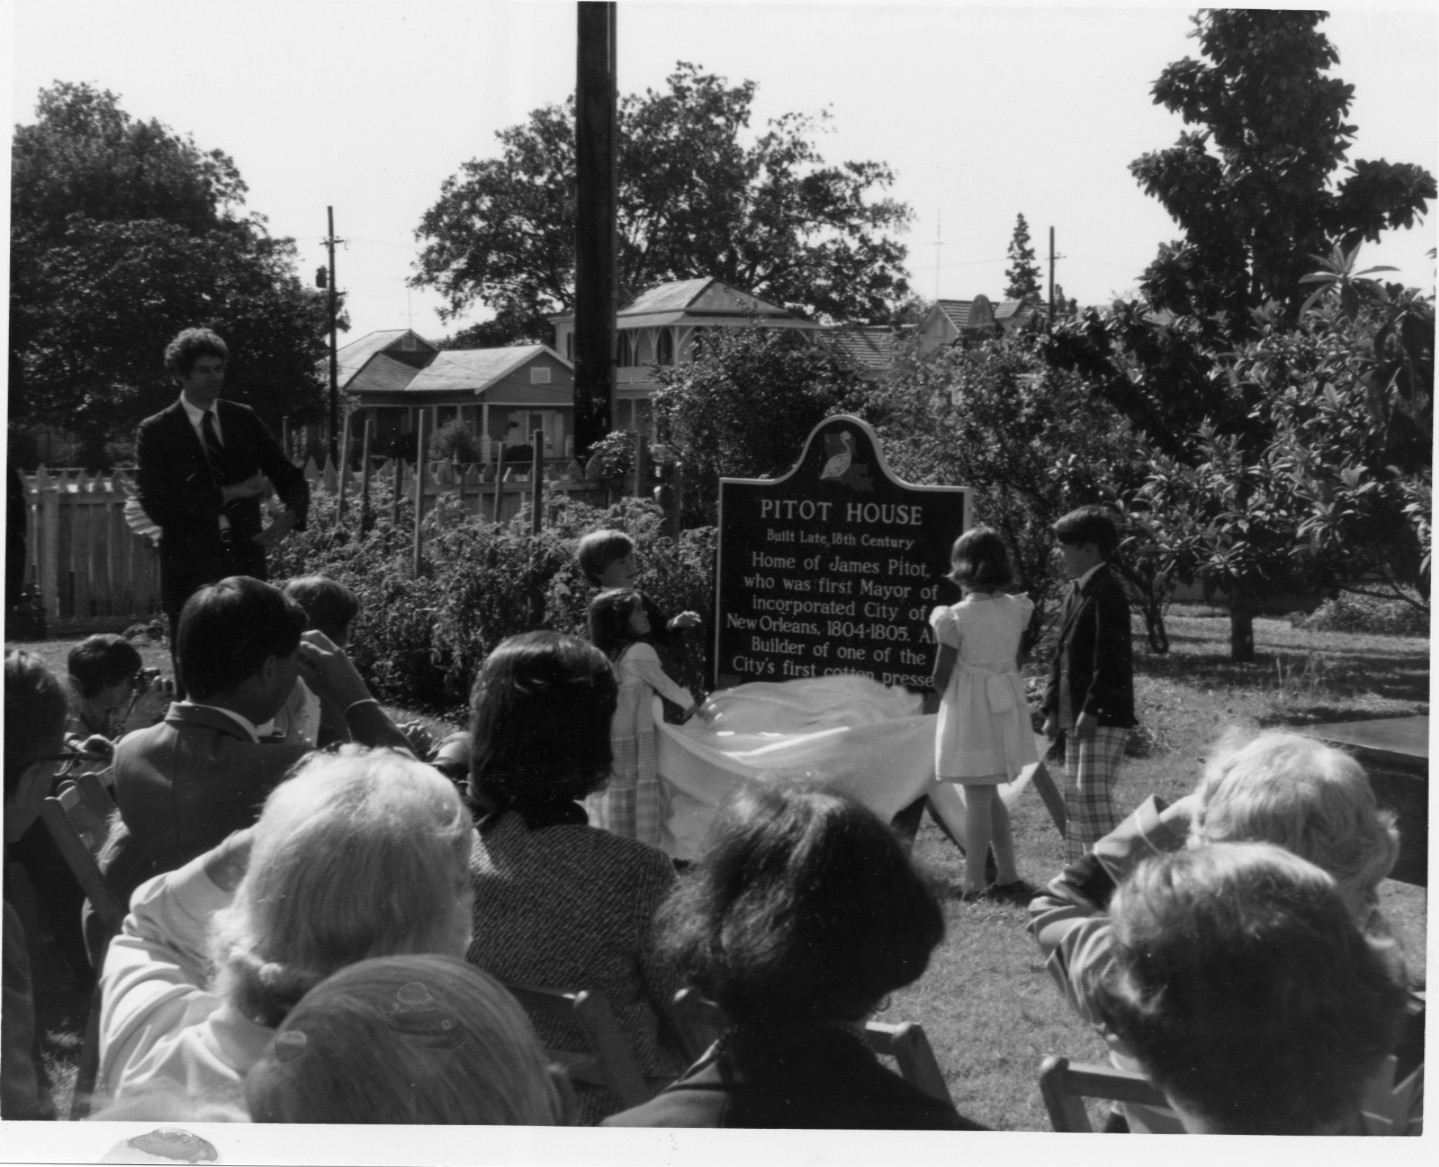 Dedication of Pitot House Historical Marker